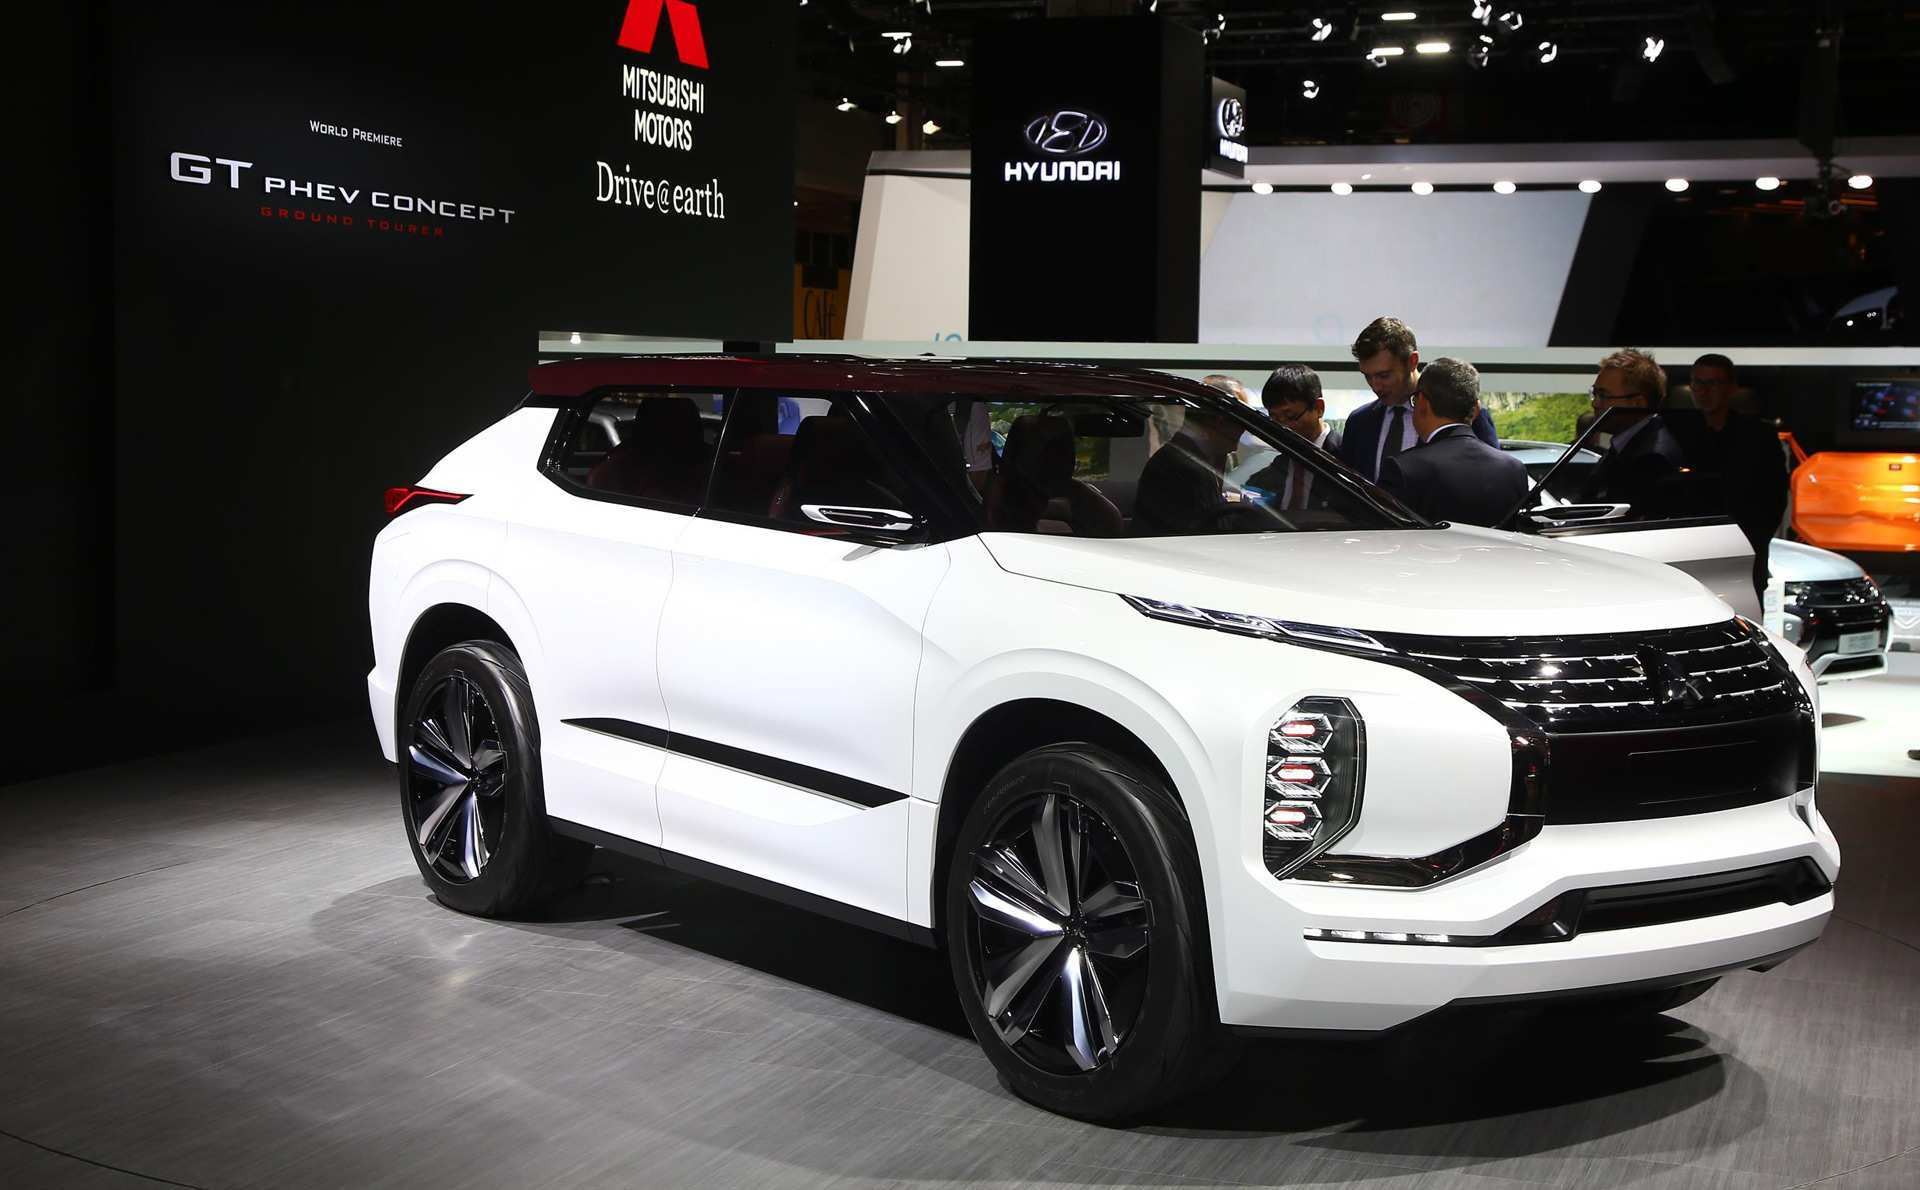 61 Concept of Mitsubishi Gt 2020 Interior by Mitsubishi Gt 2020